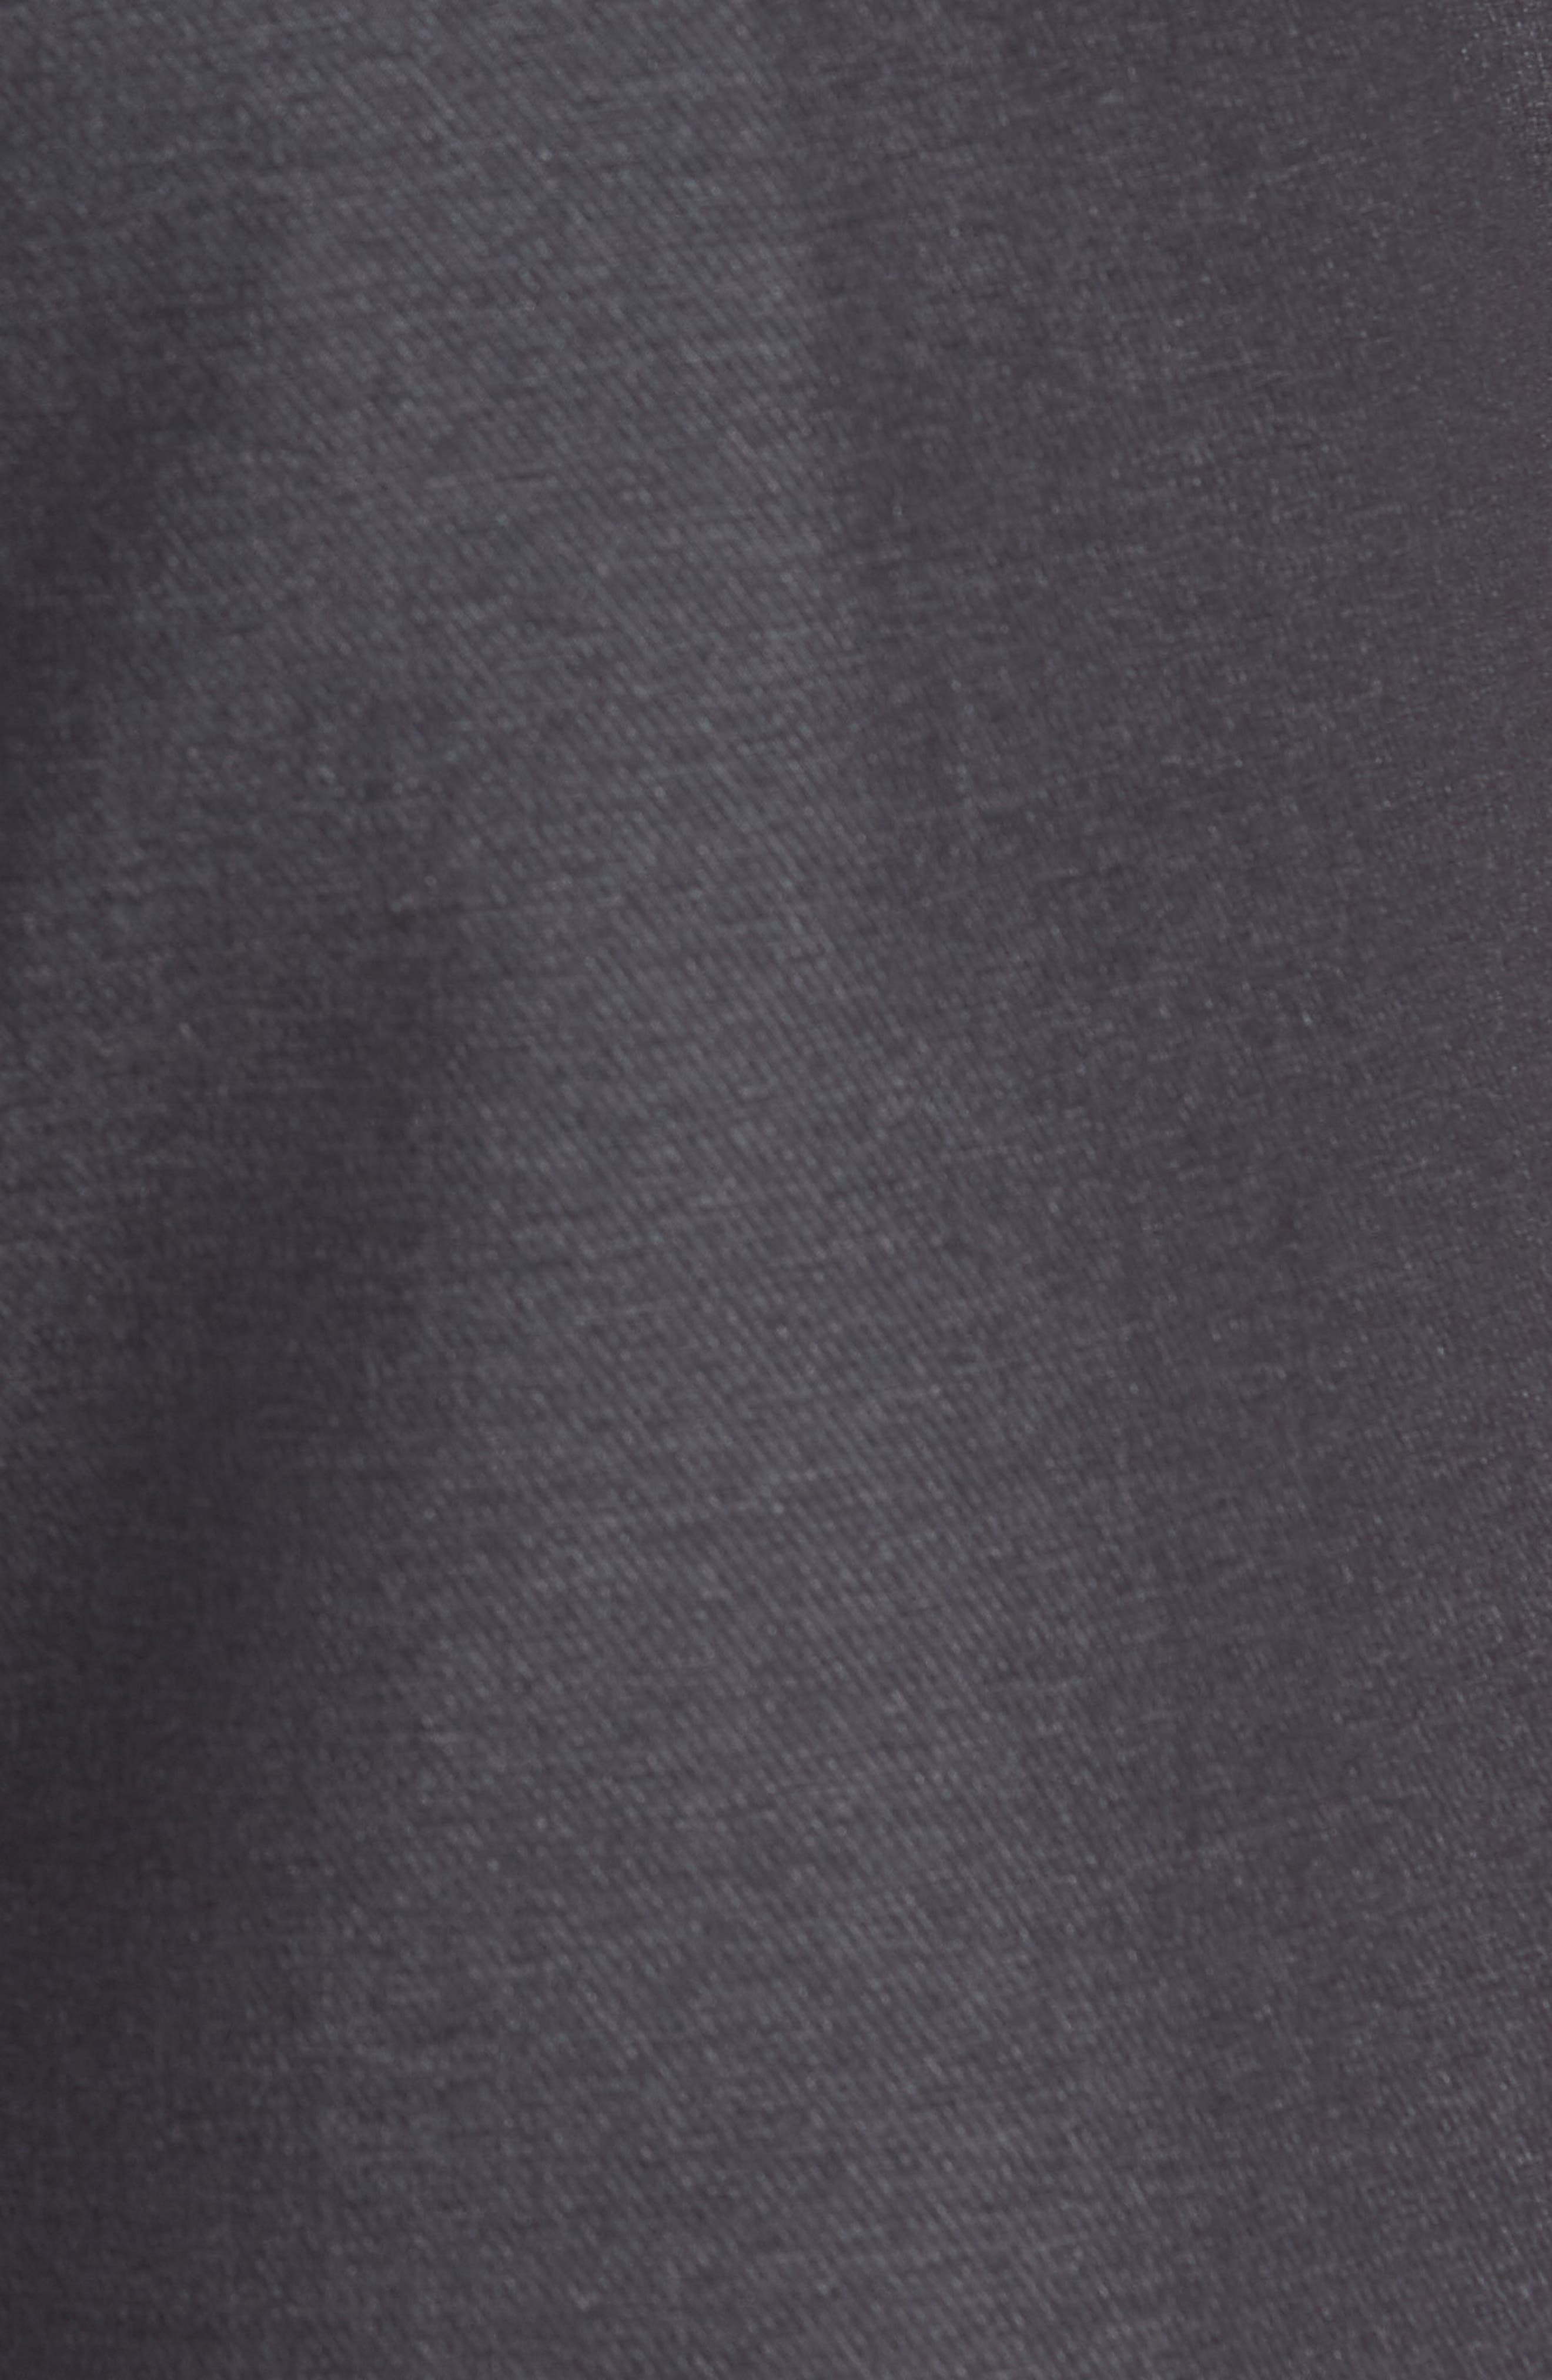 Performance Chino Shorts,                             Alternate thumbnail 5, color,                             Grey Onyx Heather